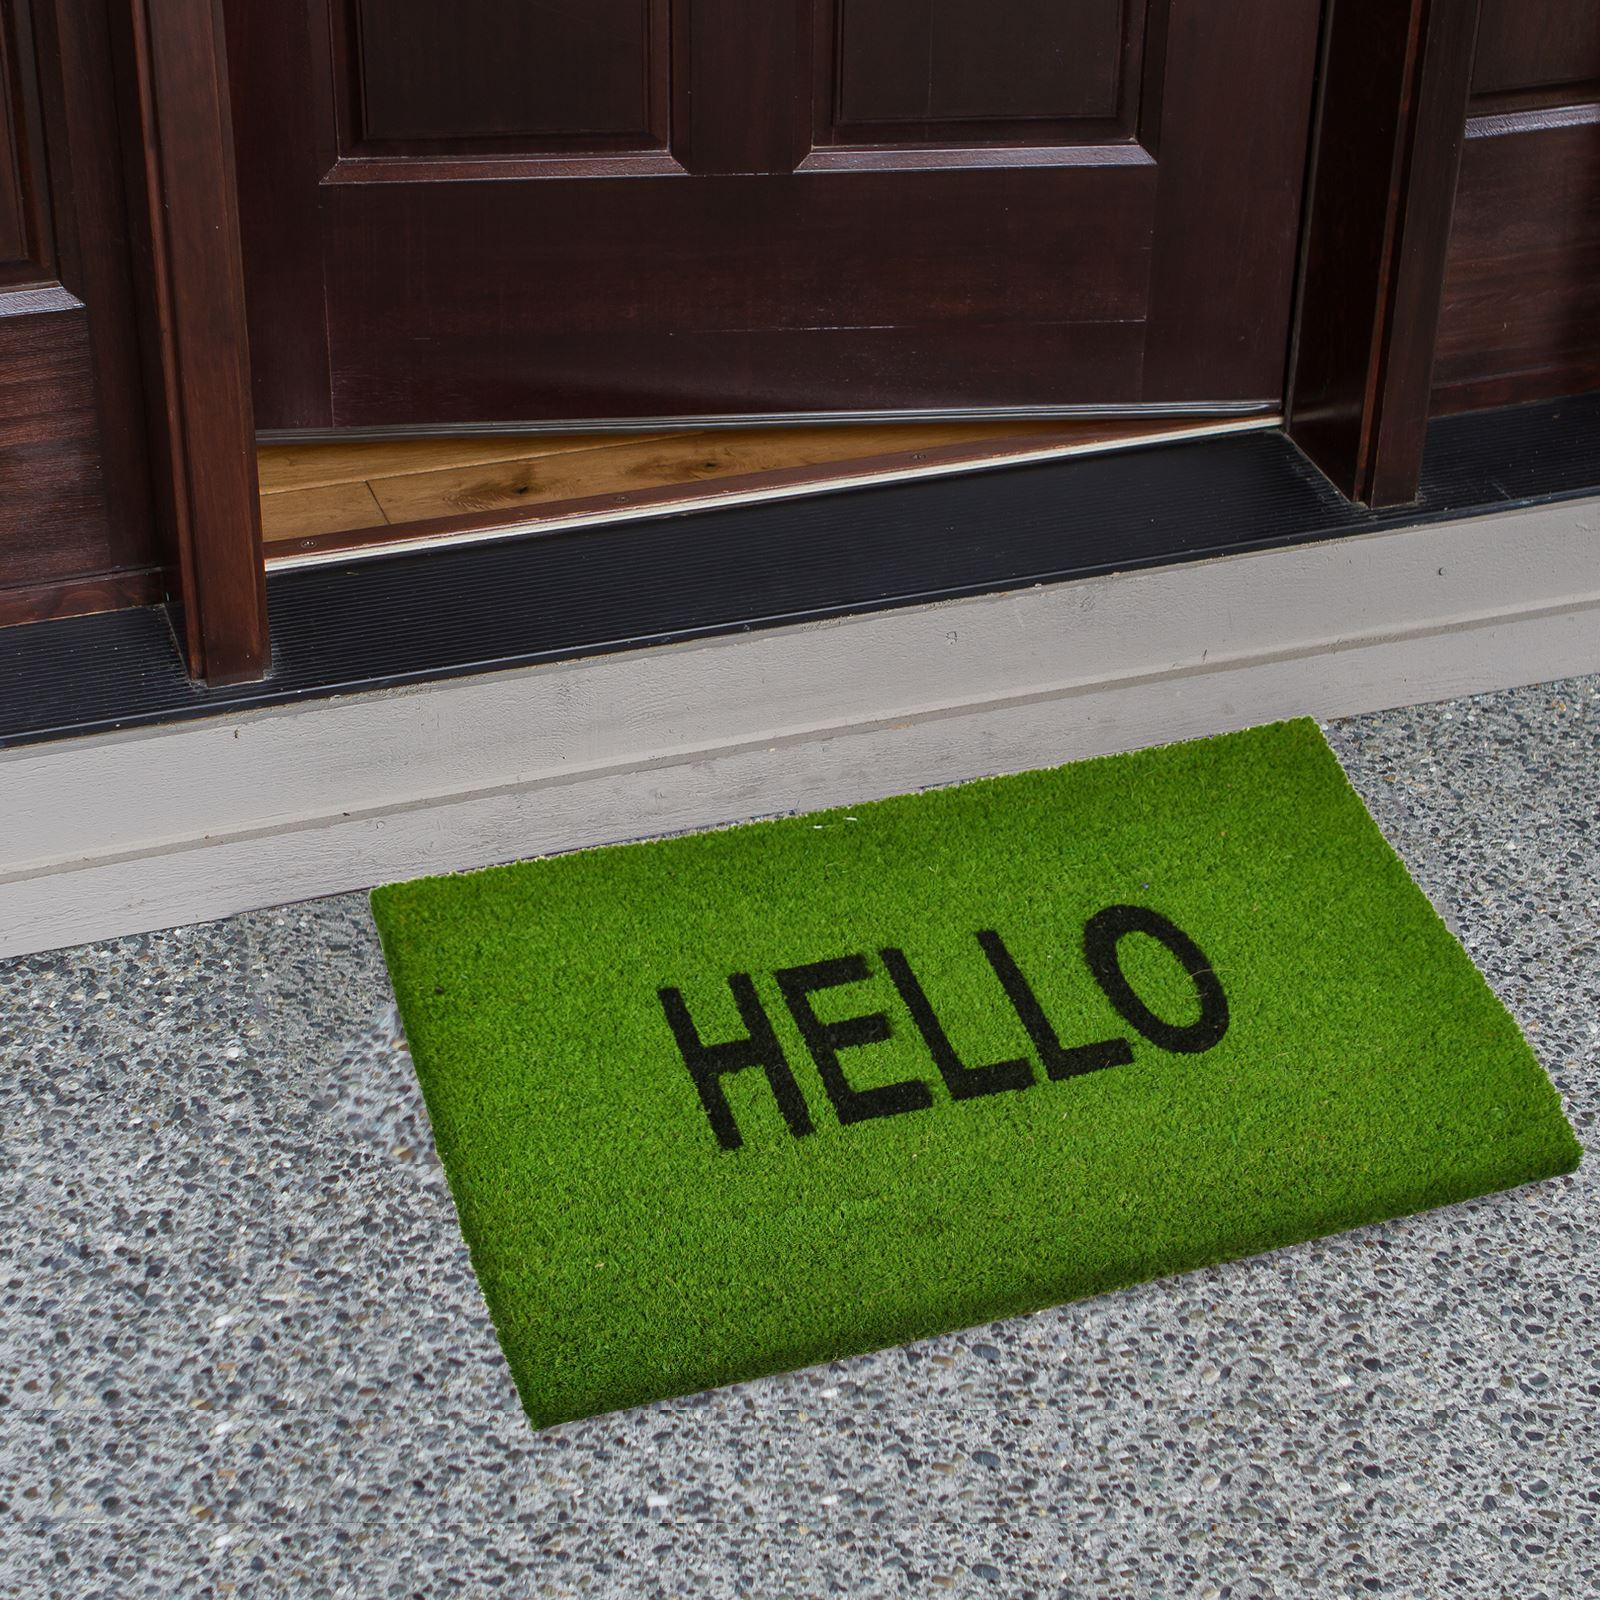 Plain-Non-Slip-Door-Mat-Tough-Natural-Coir-PVC-Back-Welcome-Doormat-40-x-60cm miniatura 64